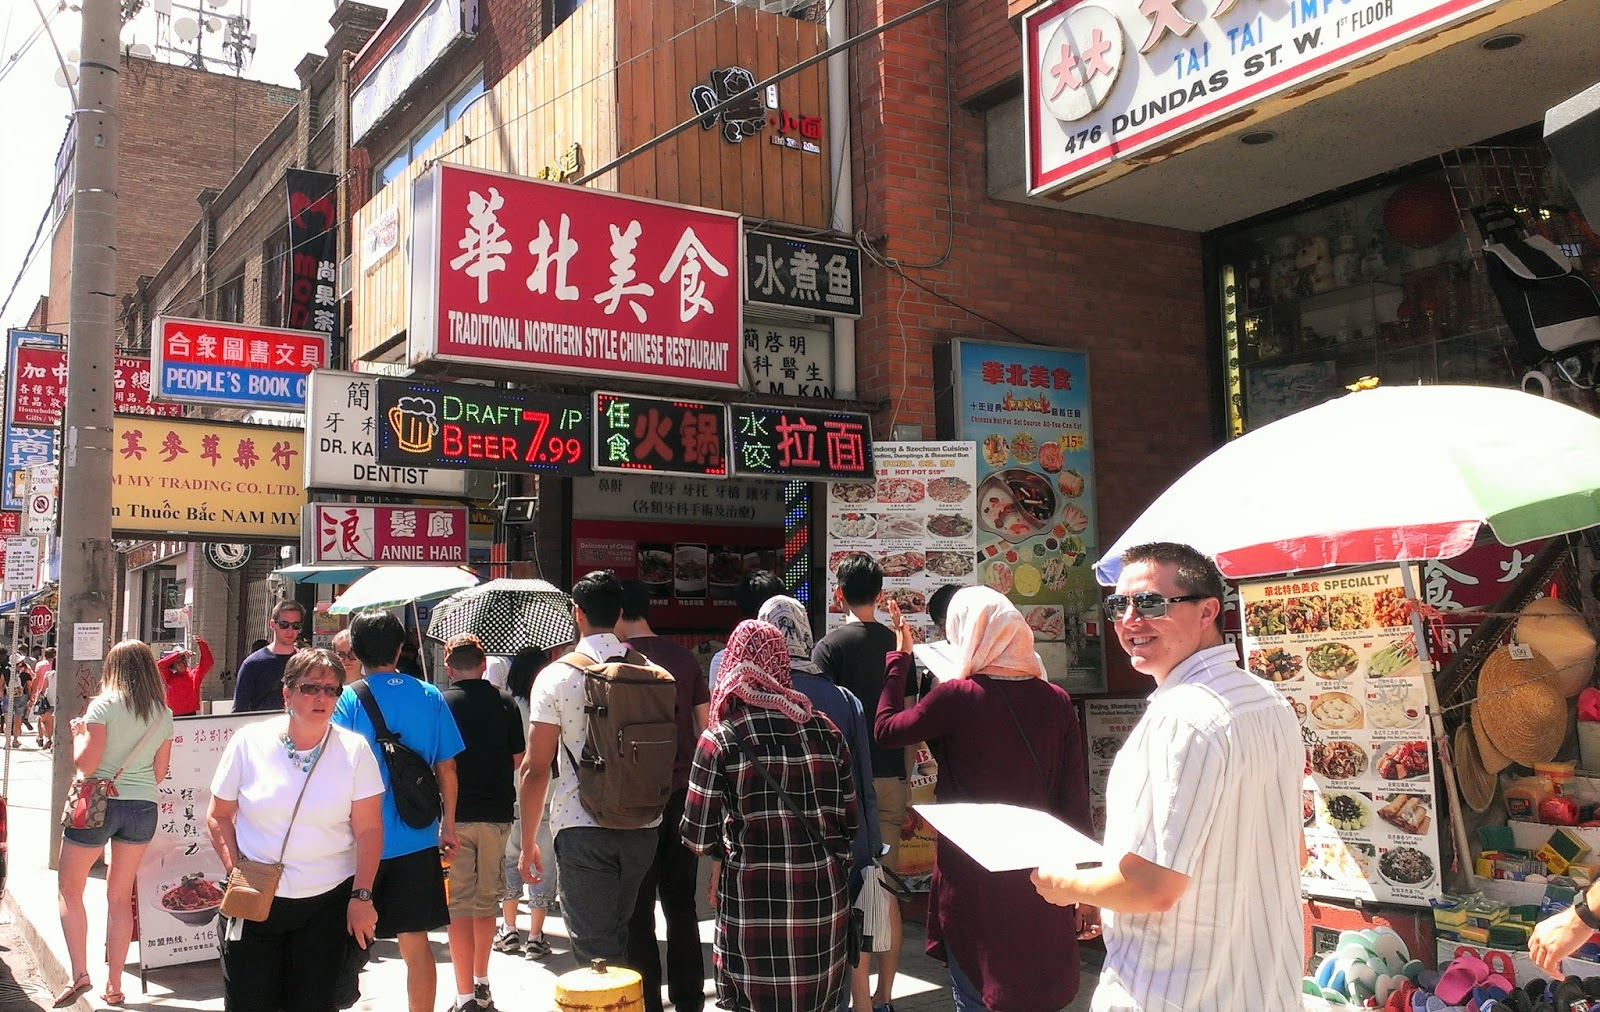 Lost & Found in Chinatown